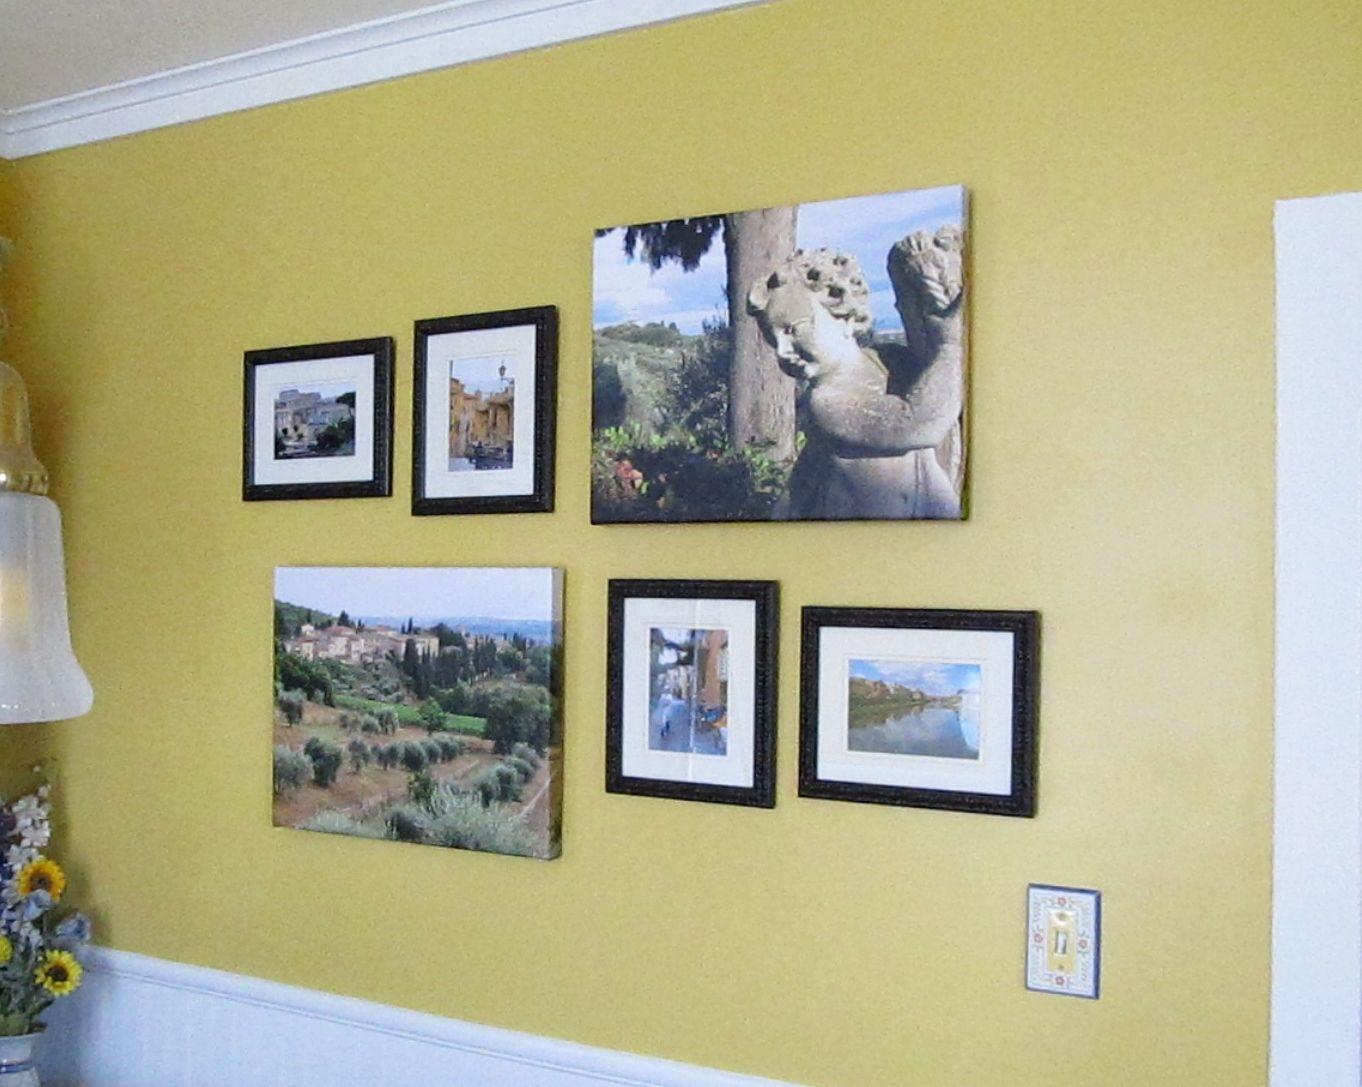 5x7 and canvas arrangement | Photo Wall Arrangements | Pinterest ...